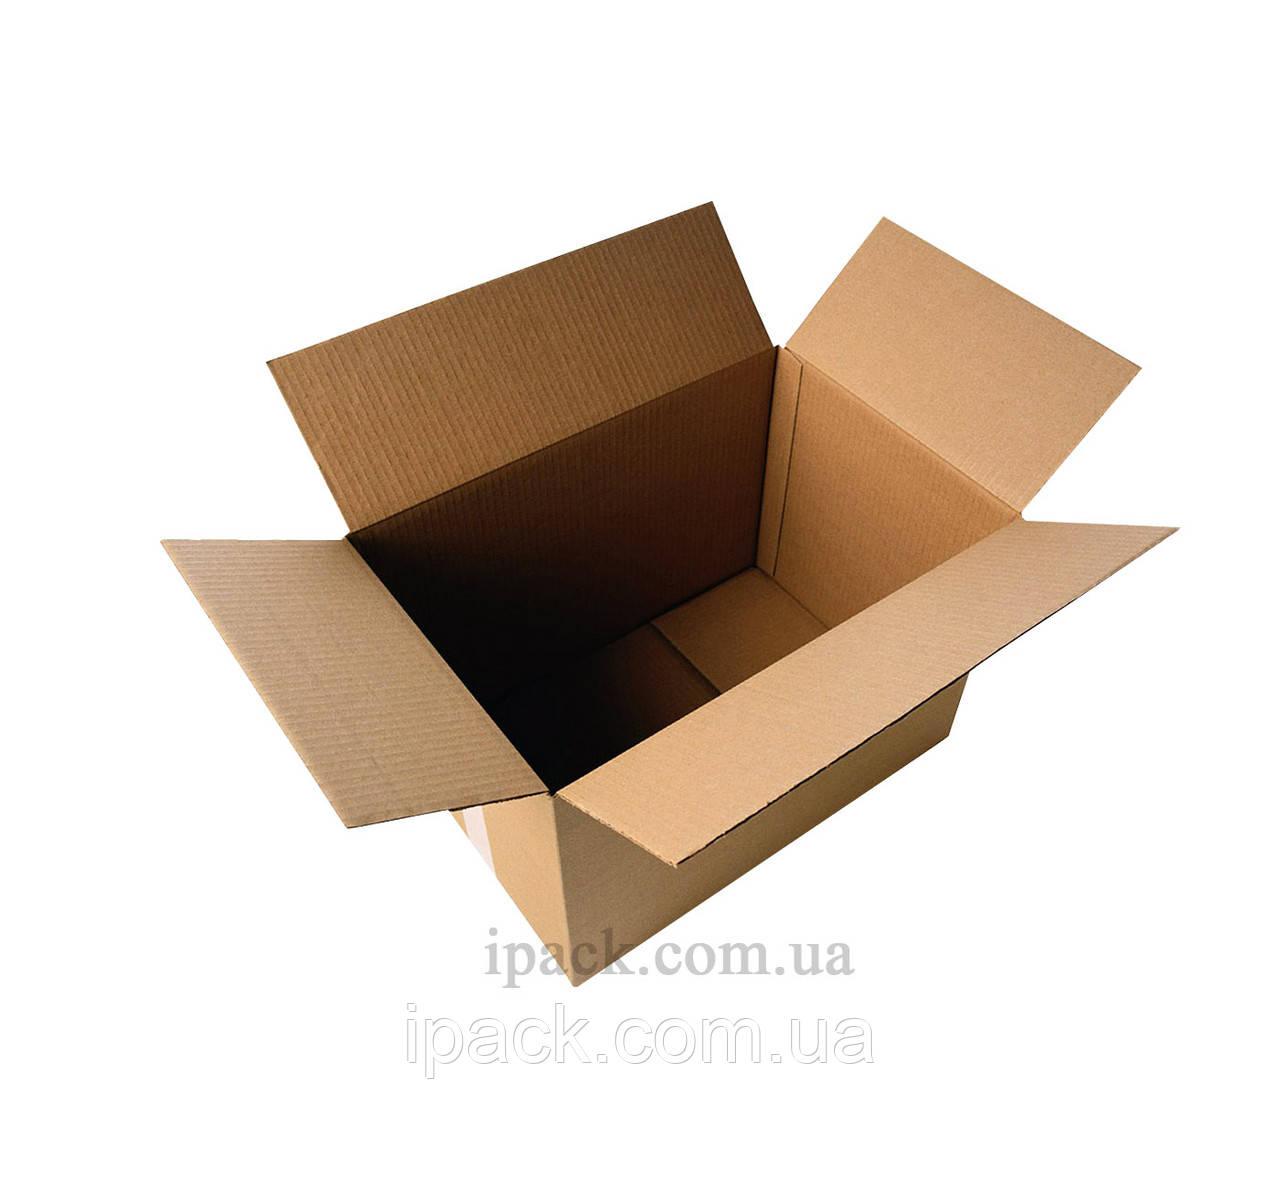 Гофроящик 300*300*310 мм, бурый, четырехклапанный картонный короб